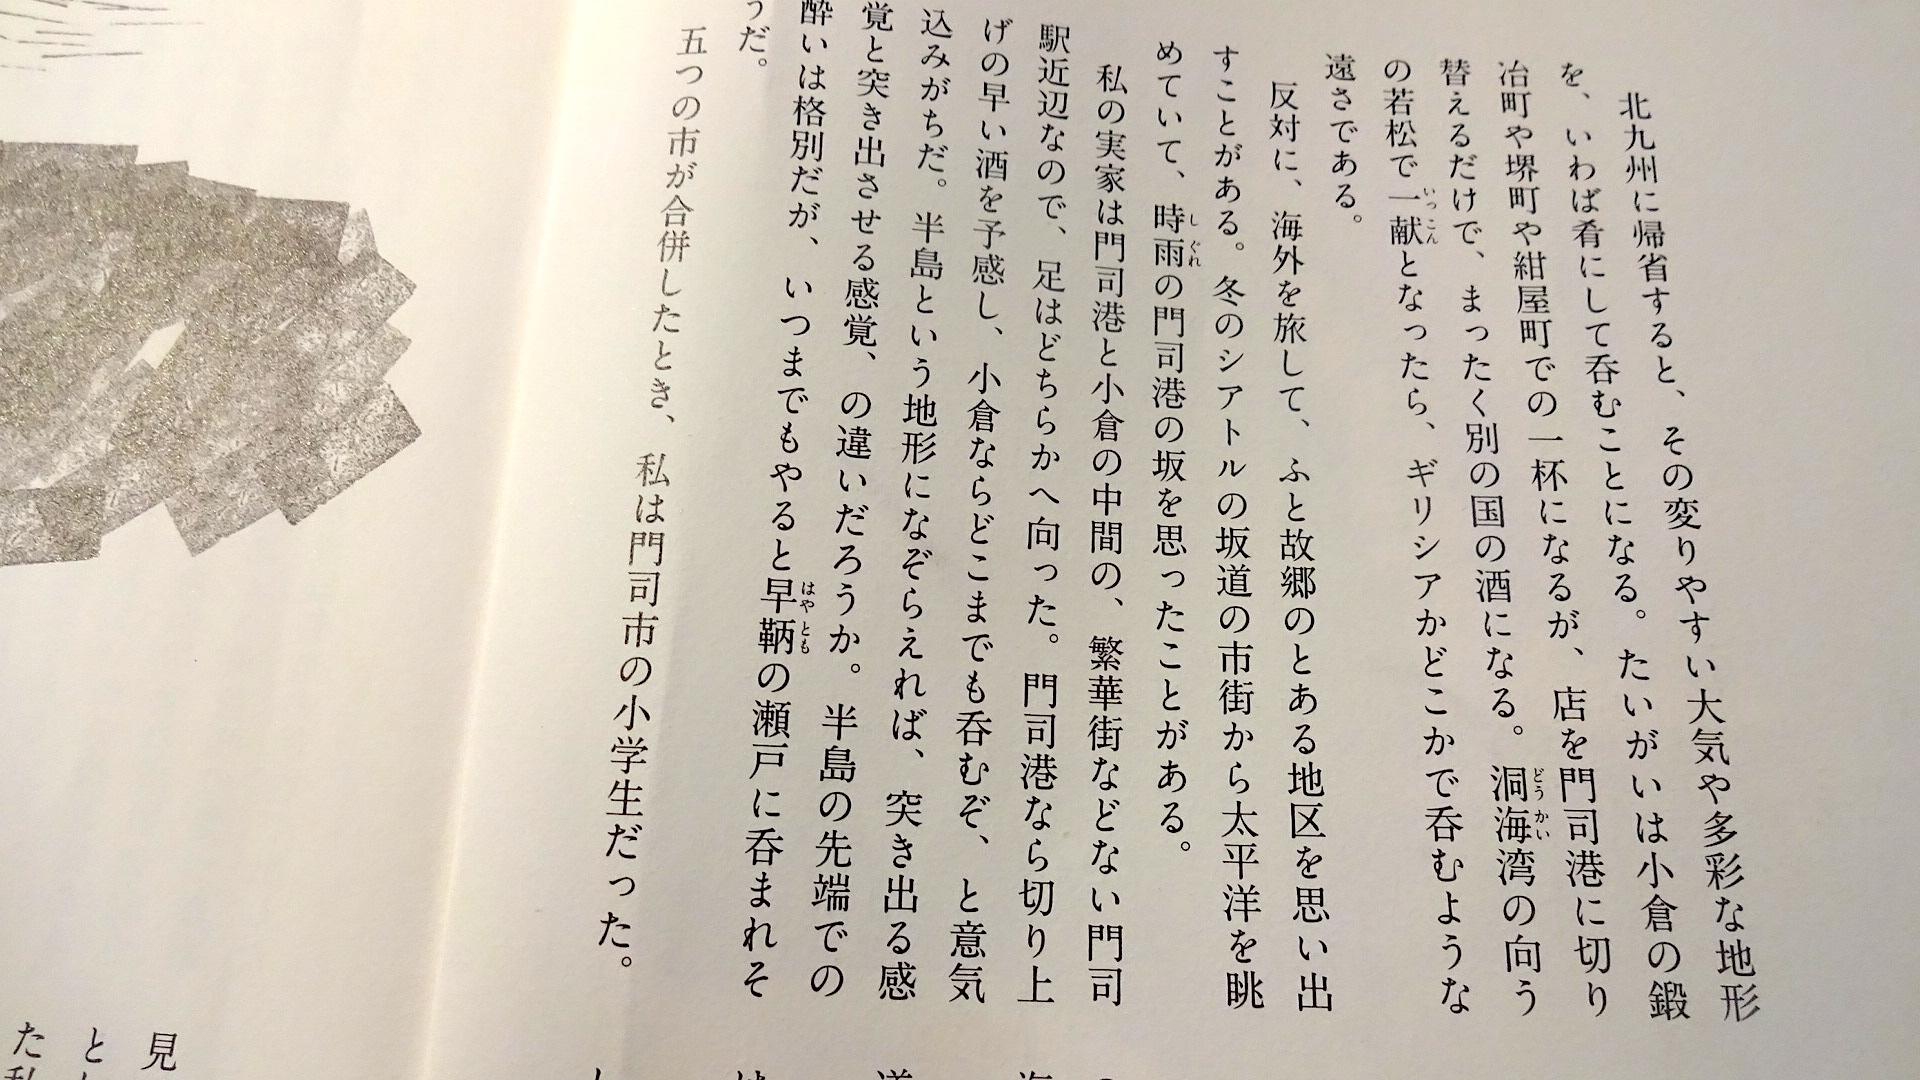 https://cdn-ak2.f.st-hatena.com/images/fotolife/s/shioshiohida/20171205/20171205035559_original.jpg